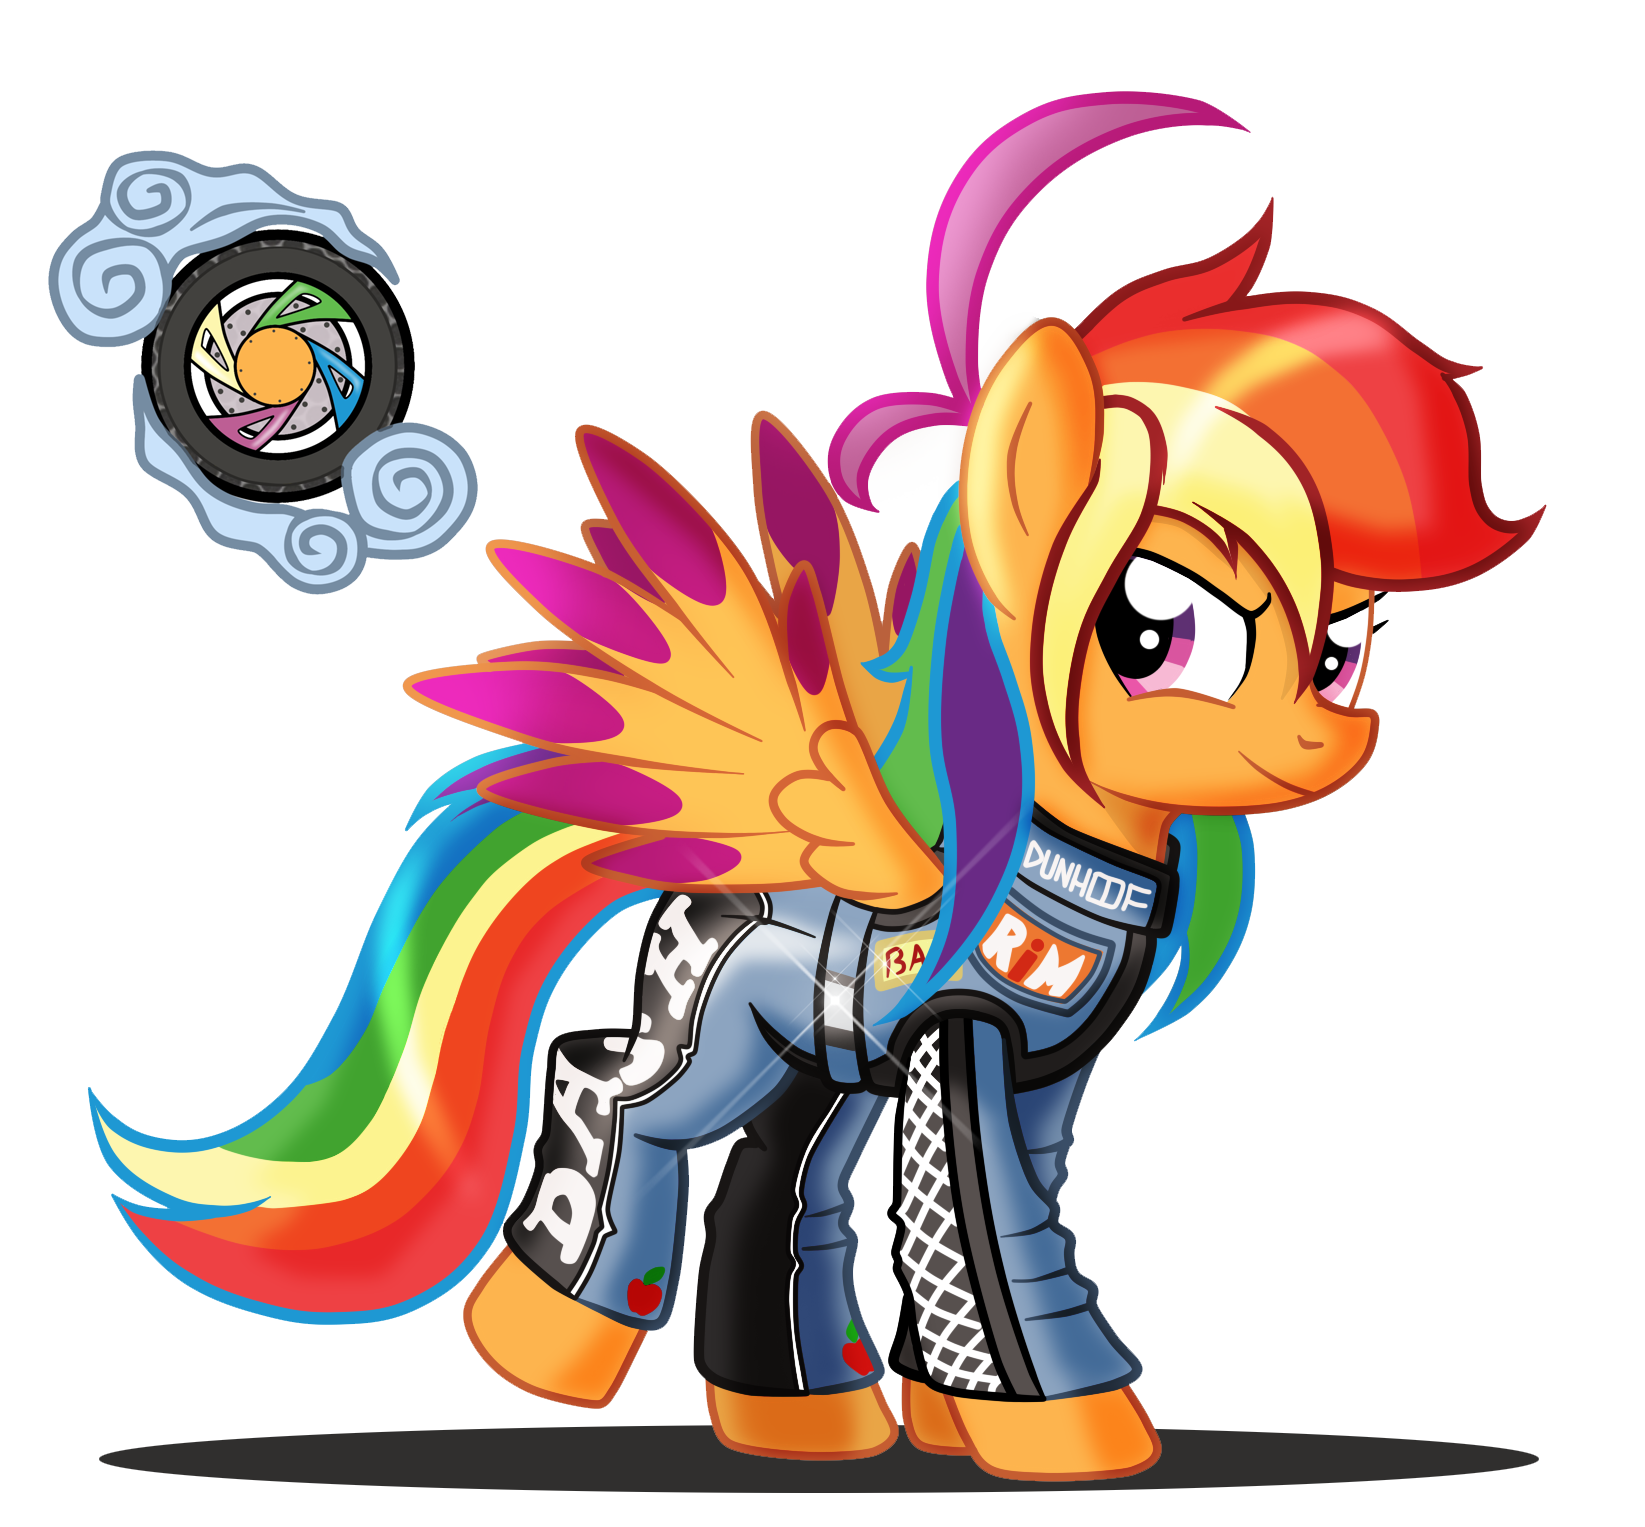 windy_dash___racing_suit_by_ruhisu-d6lcb